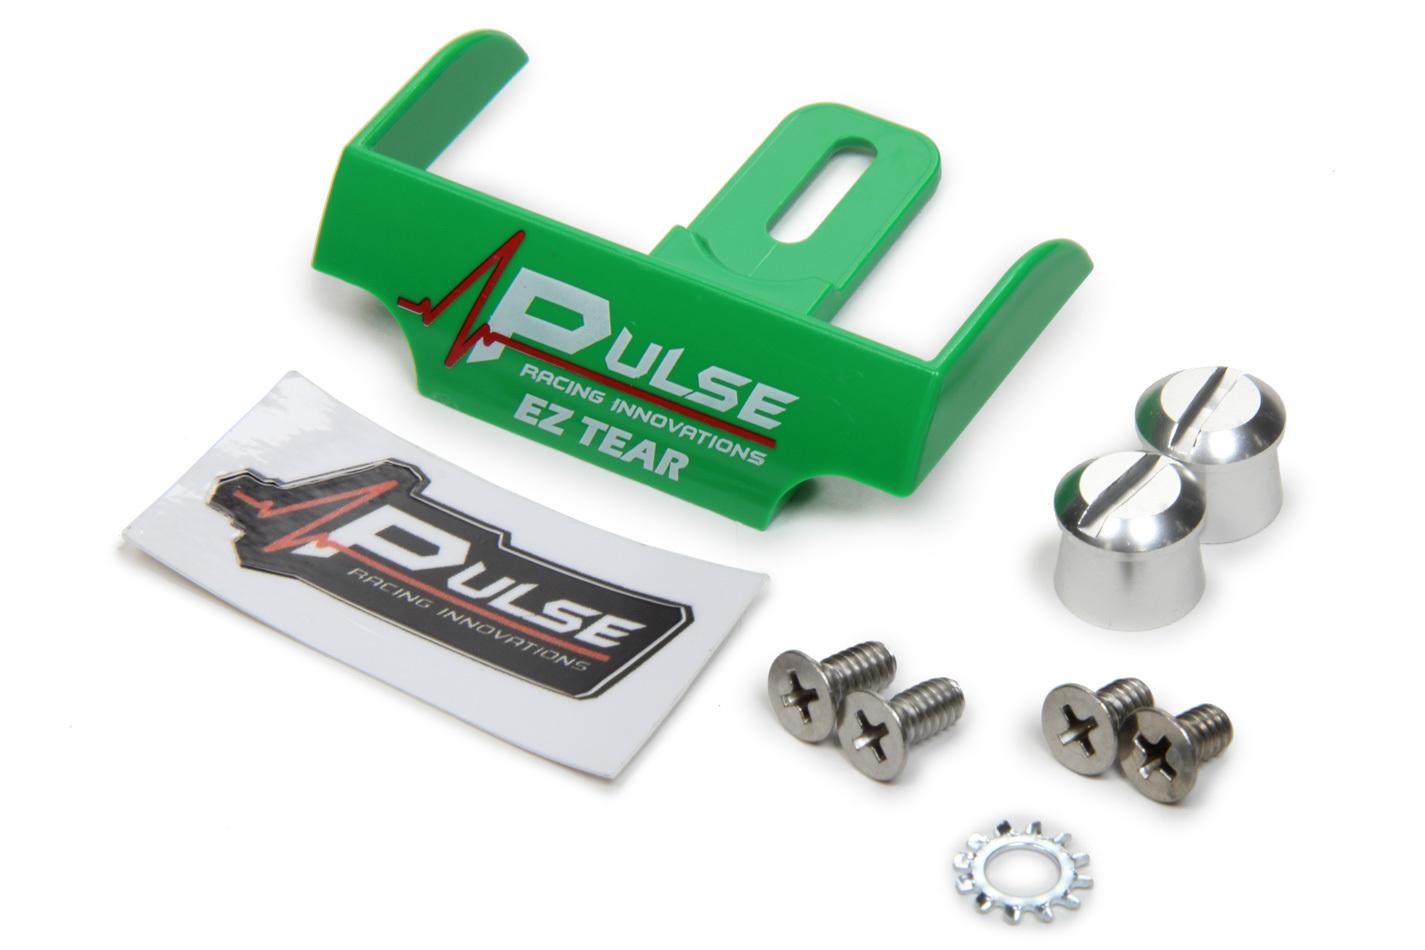 Pulse Racing Innovations EZTS102GRP Helmet Tear Off Ramp, Adjustable, Aluminum Post Included, Green, Each